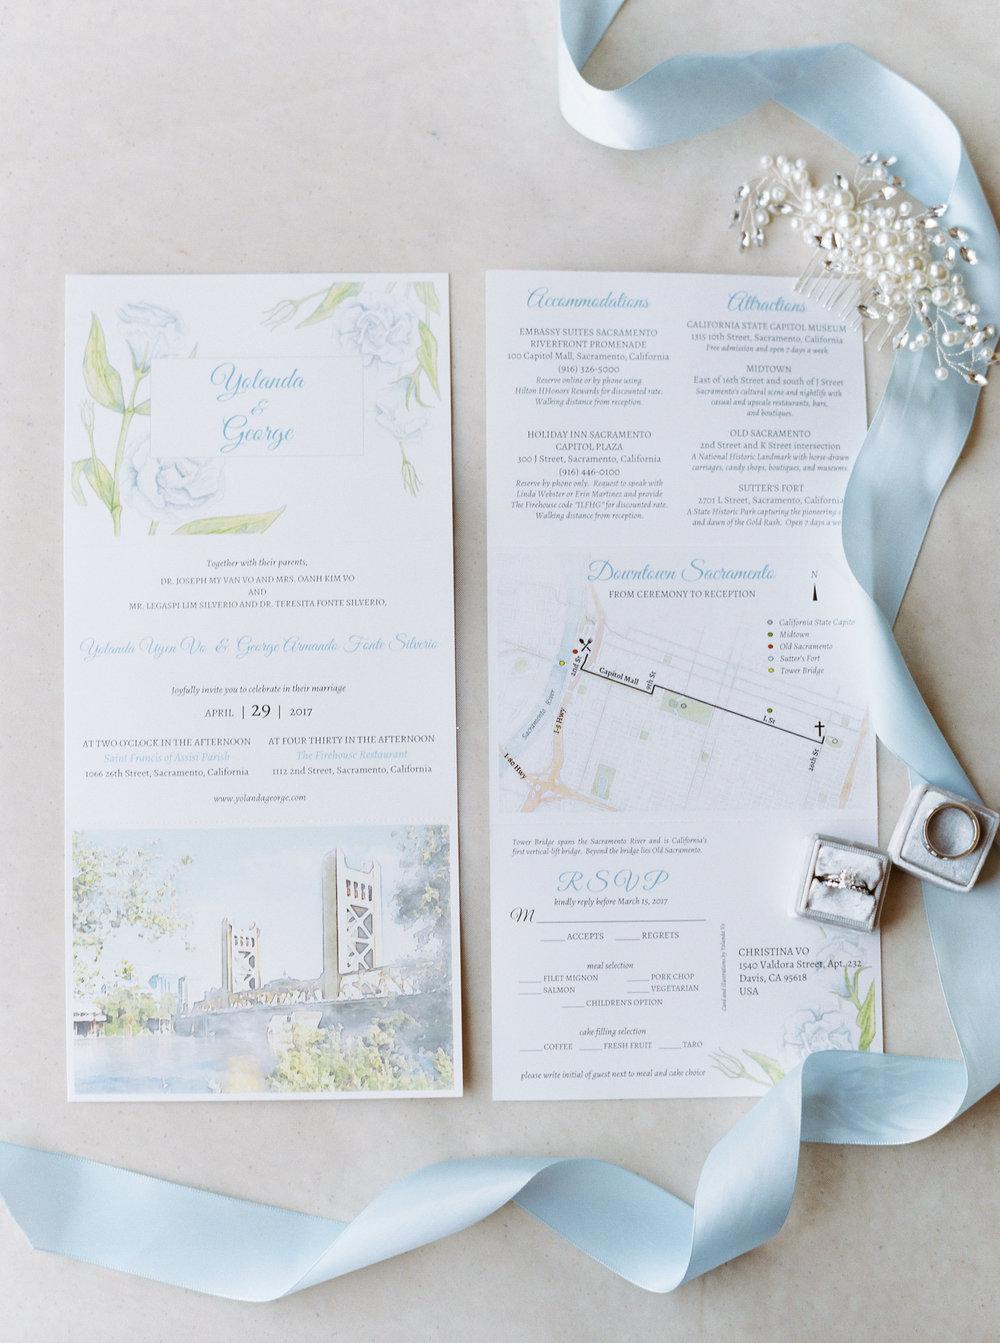 firehouse-restaurant-wedding-in-downtown-sacramento-california-7.jpg